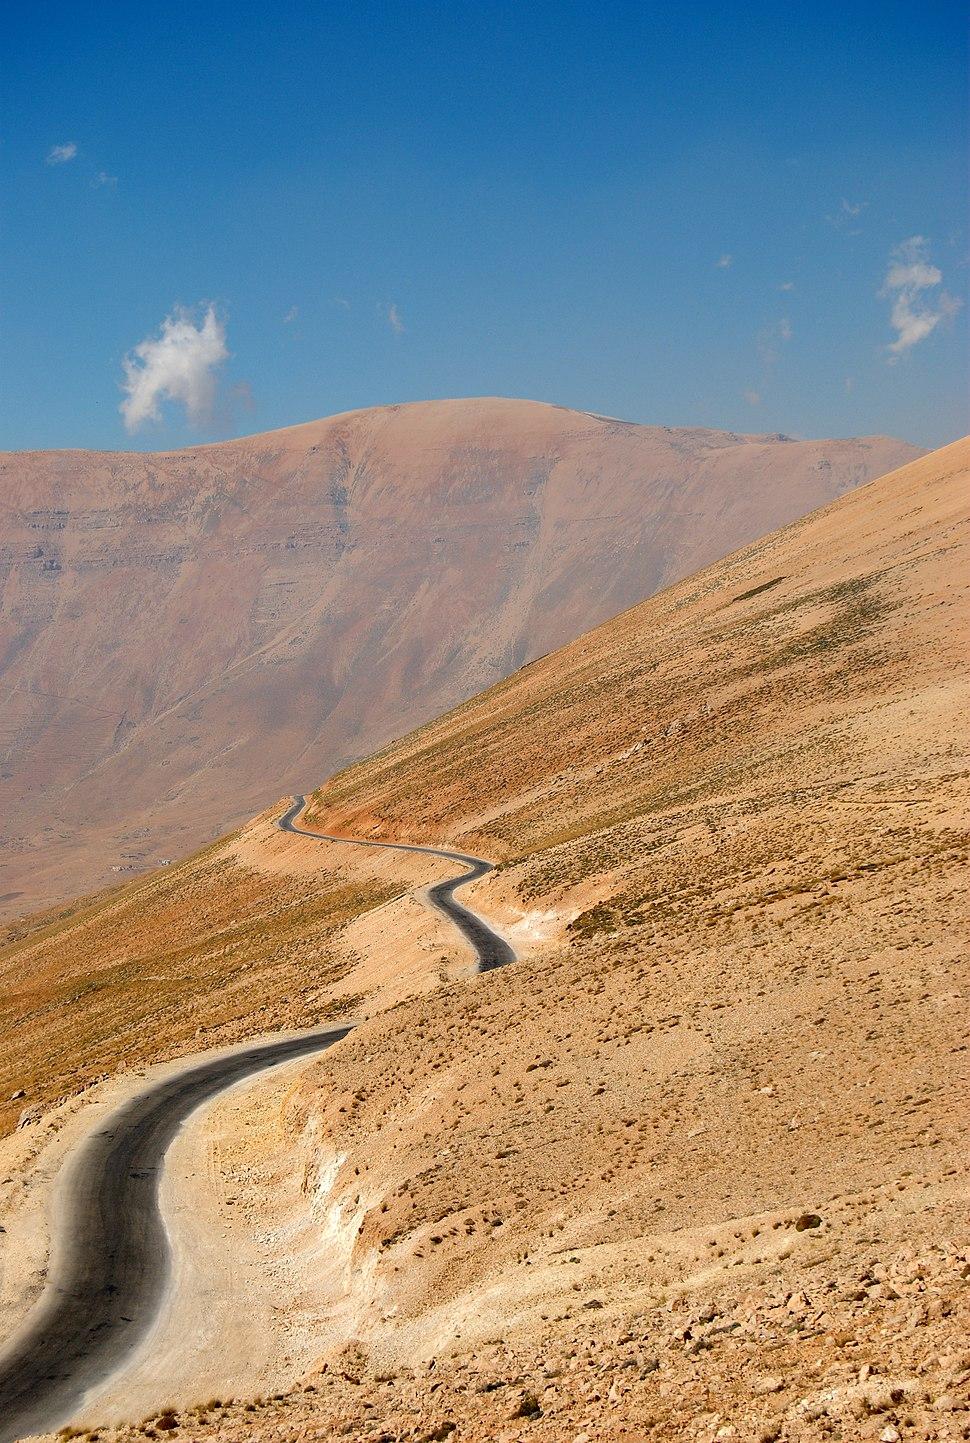 Lebanon mountains from near Maqial el Qalaa